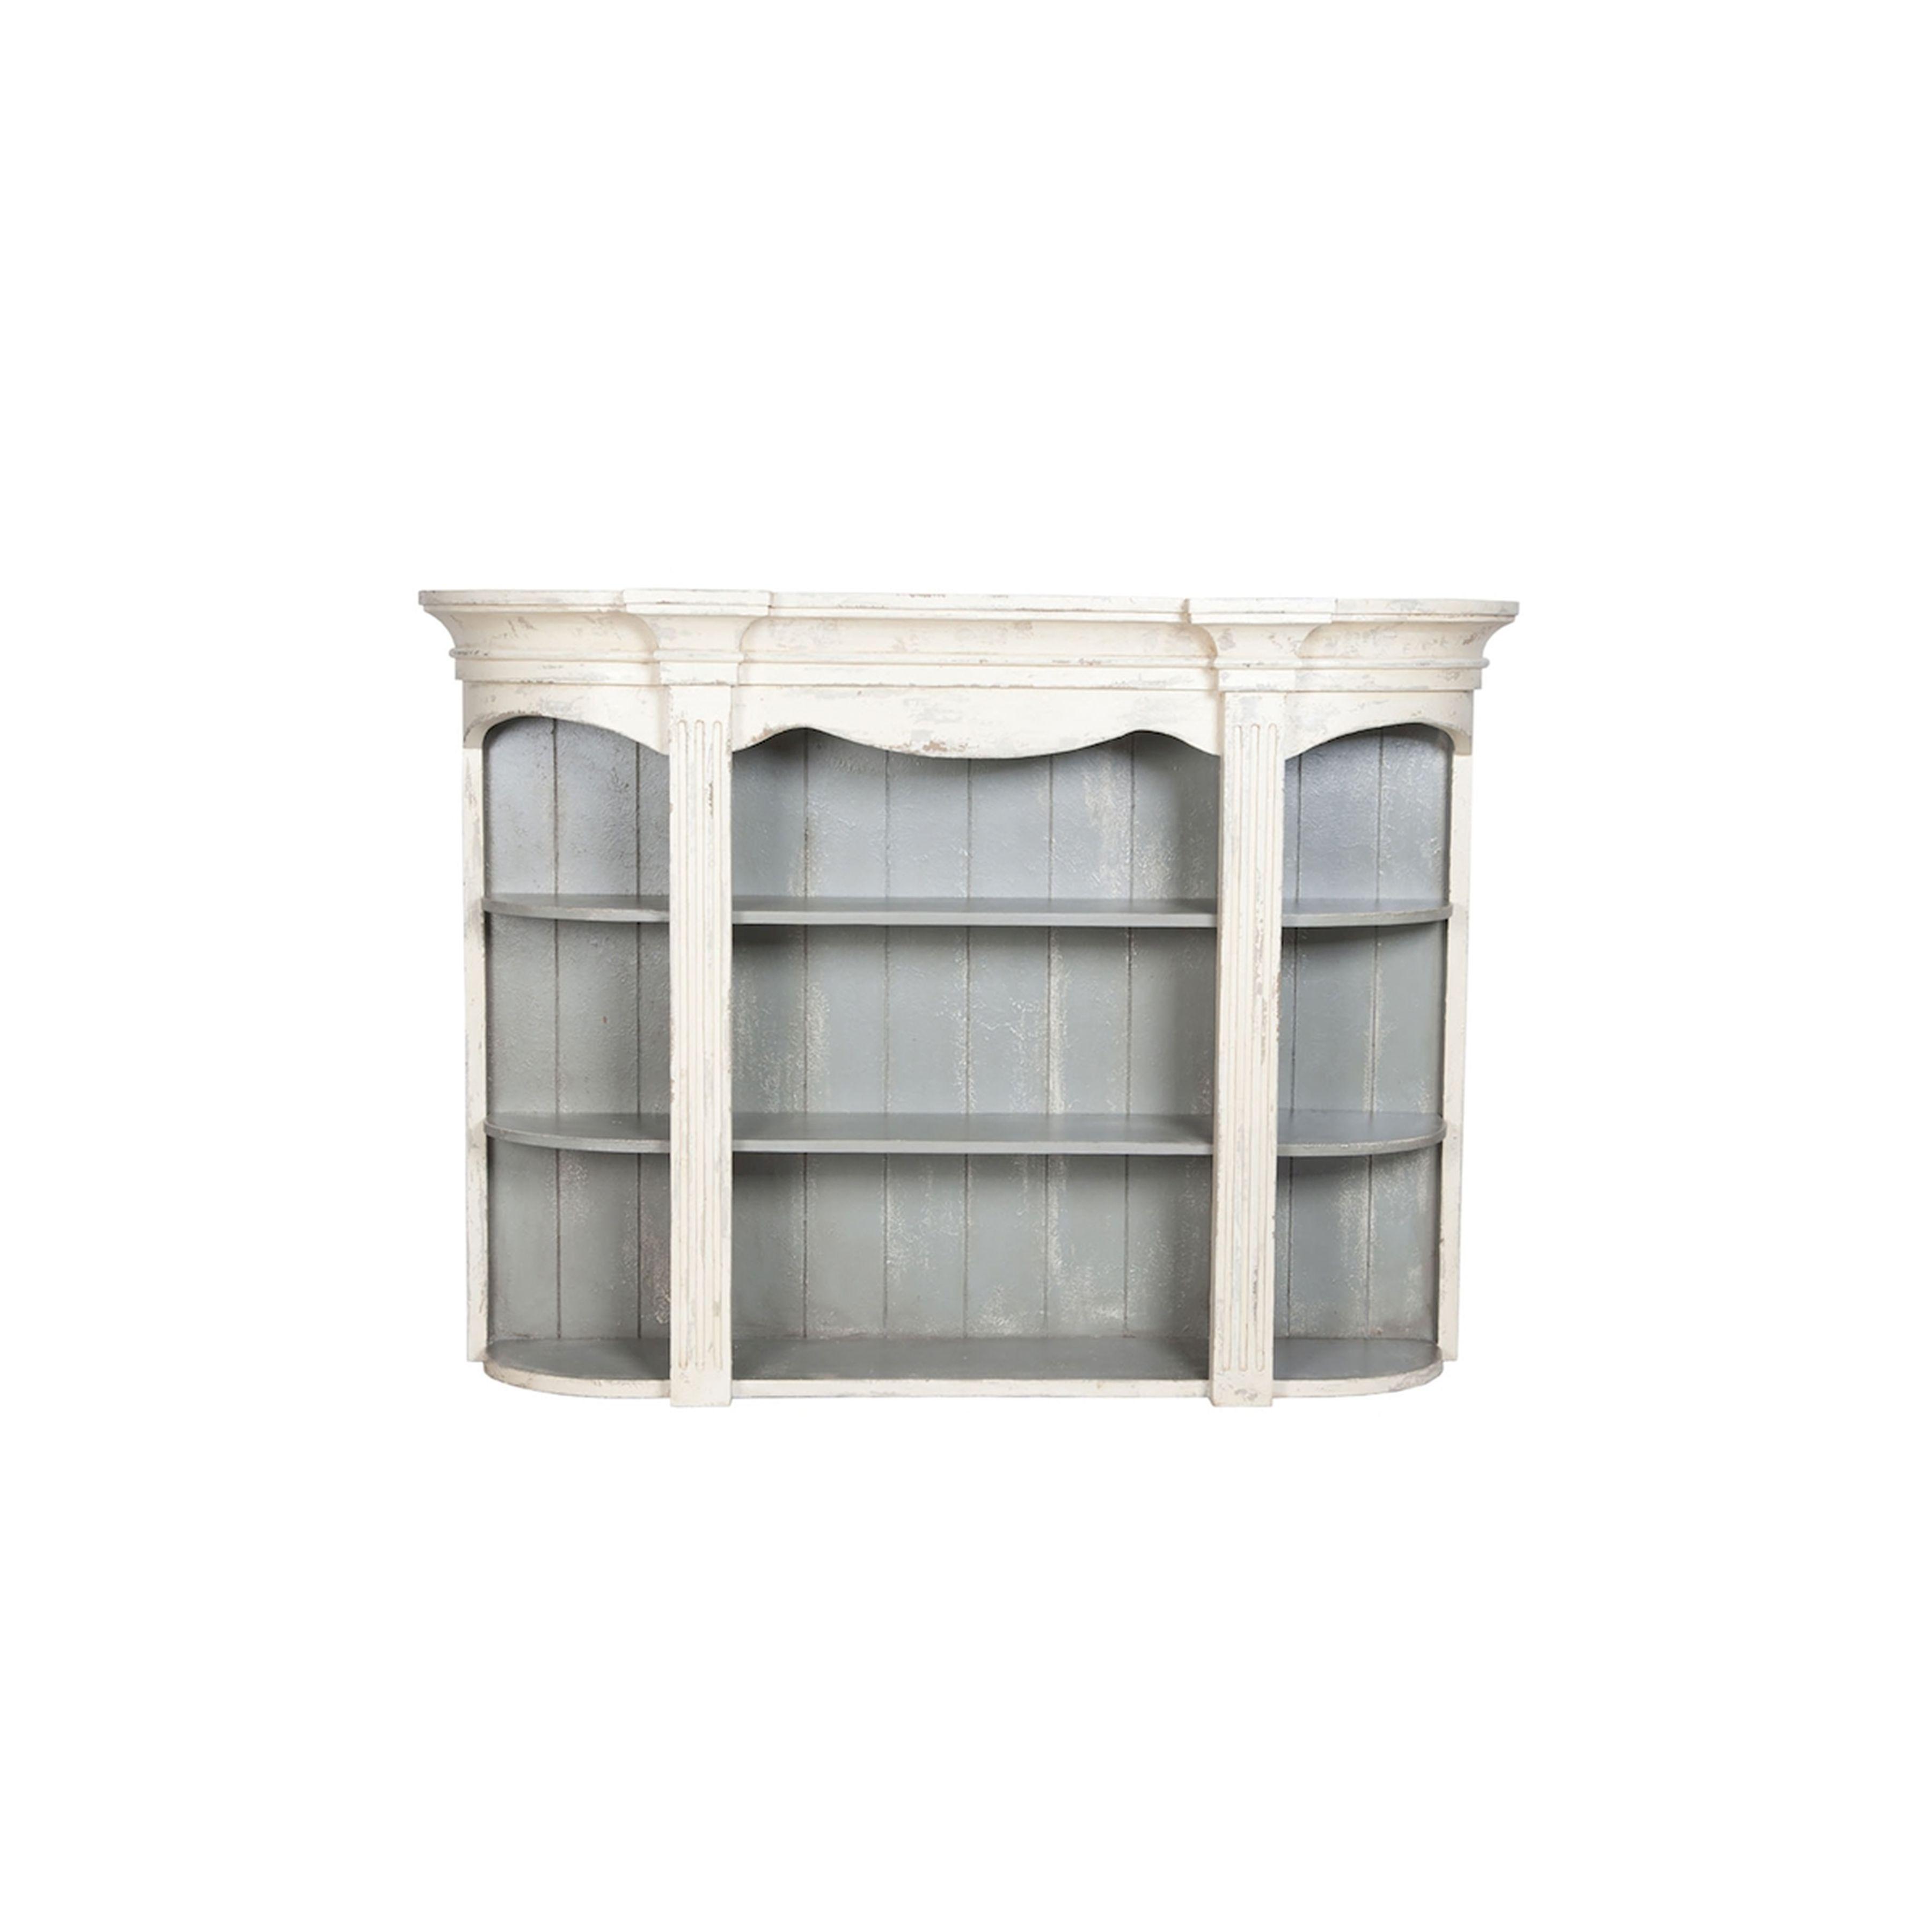 Vaucelles Display Shelf 753505 | ELK Home